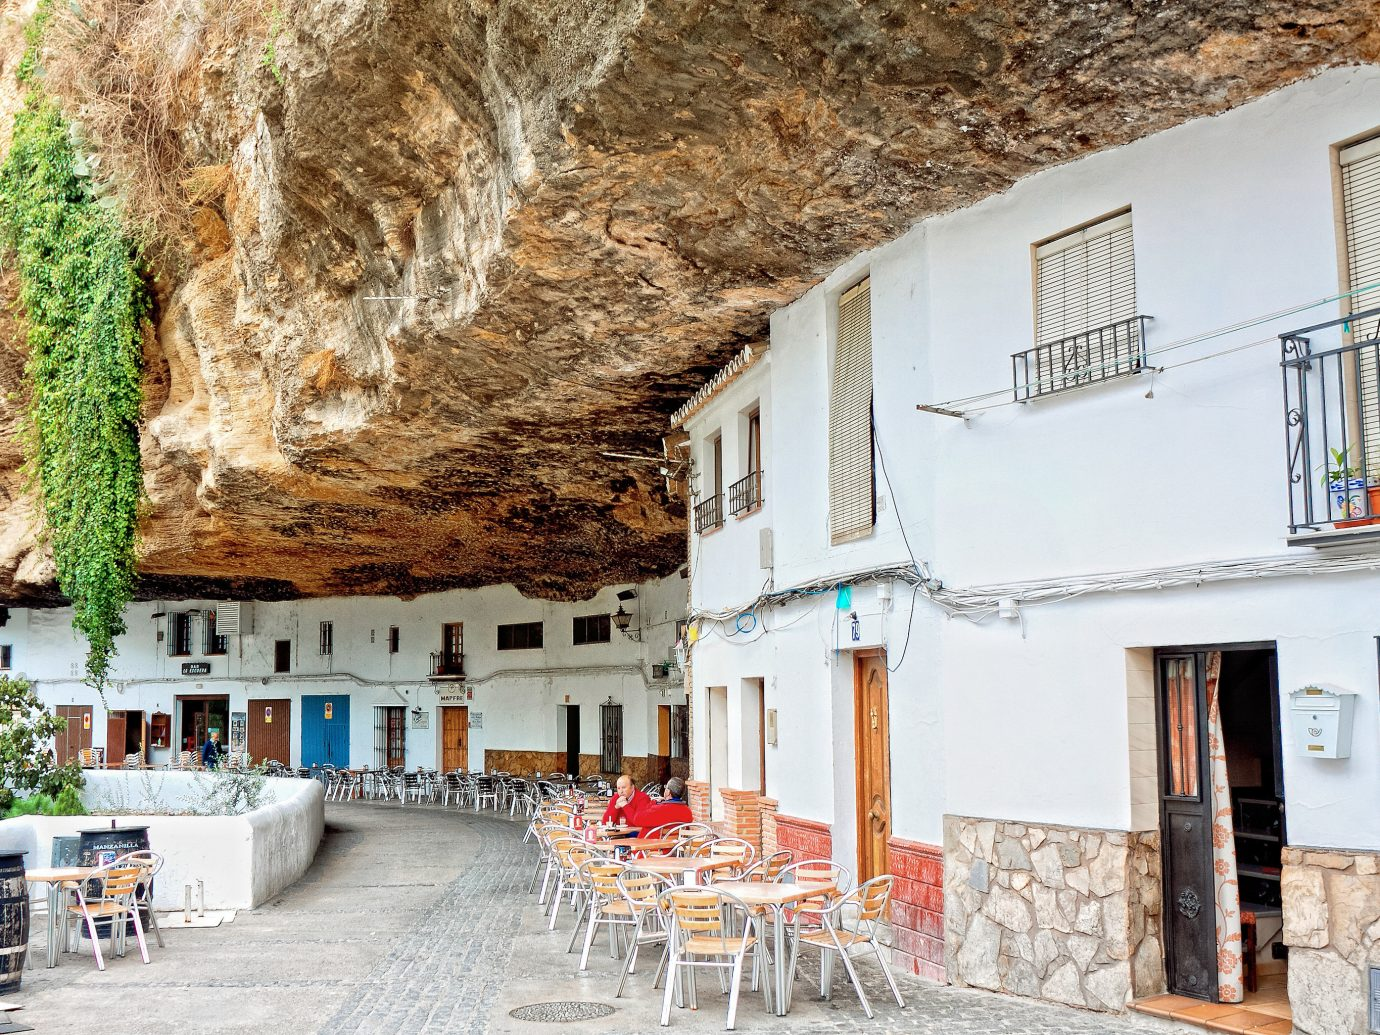 europe Spain Trip Ideas house real estate facade home hacienda Village building window tourism